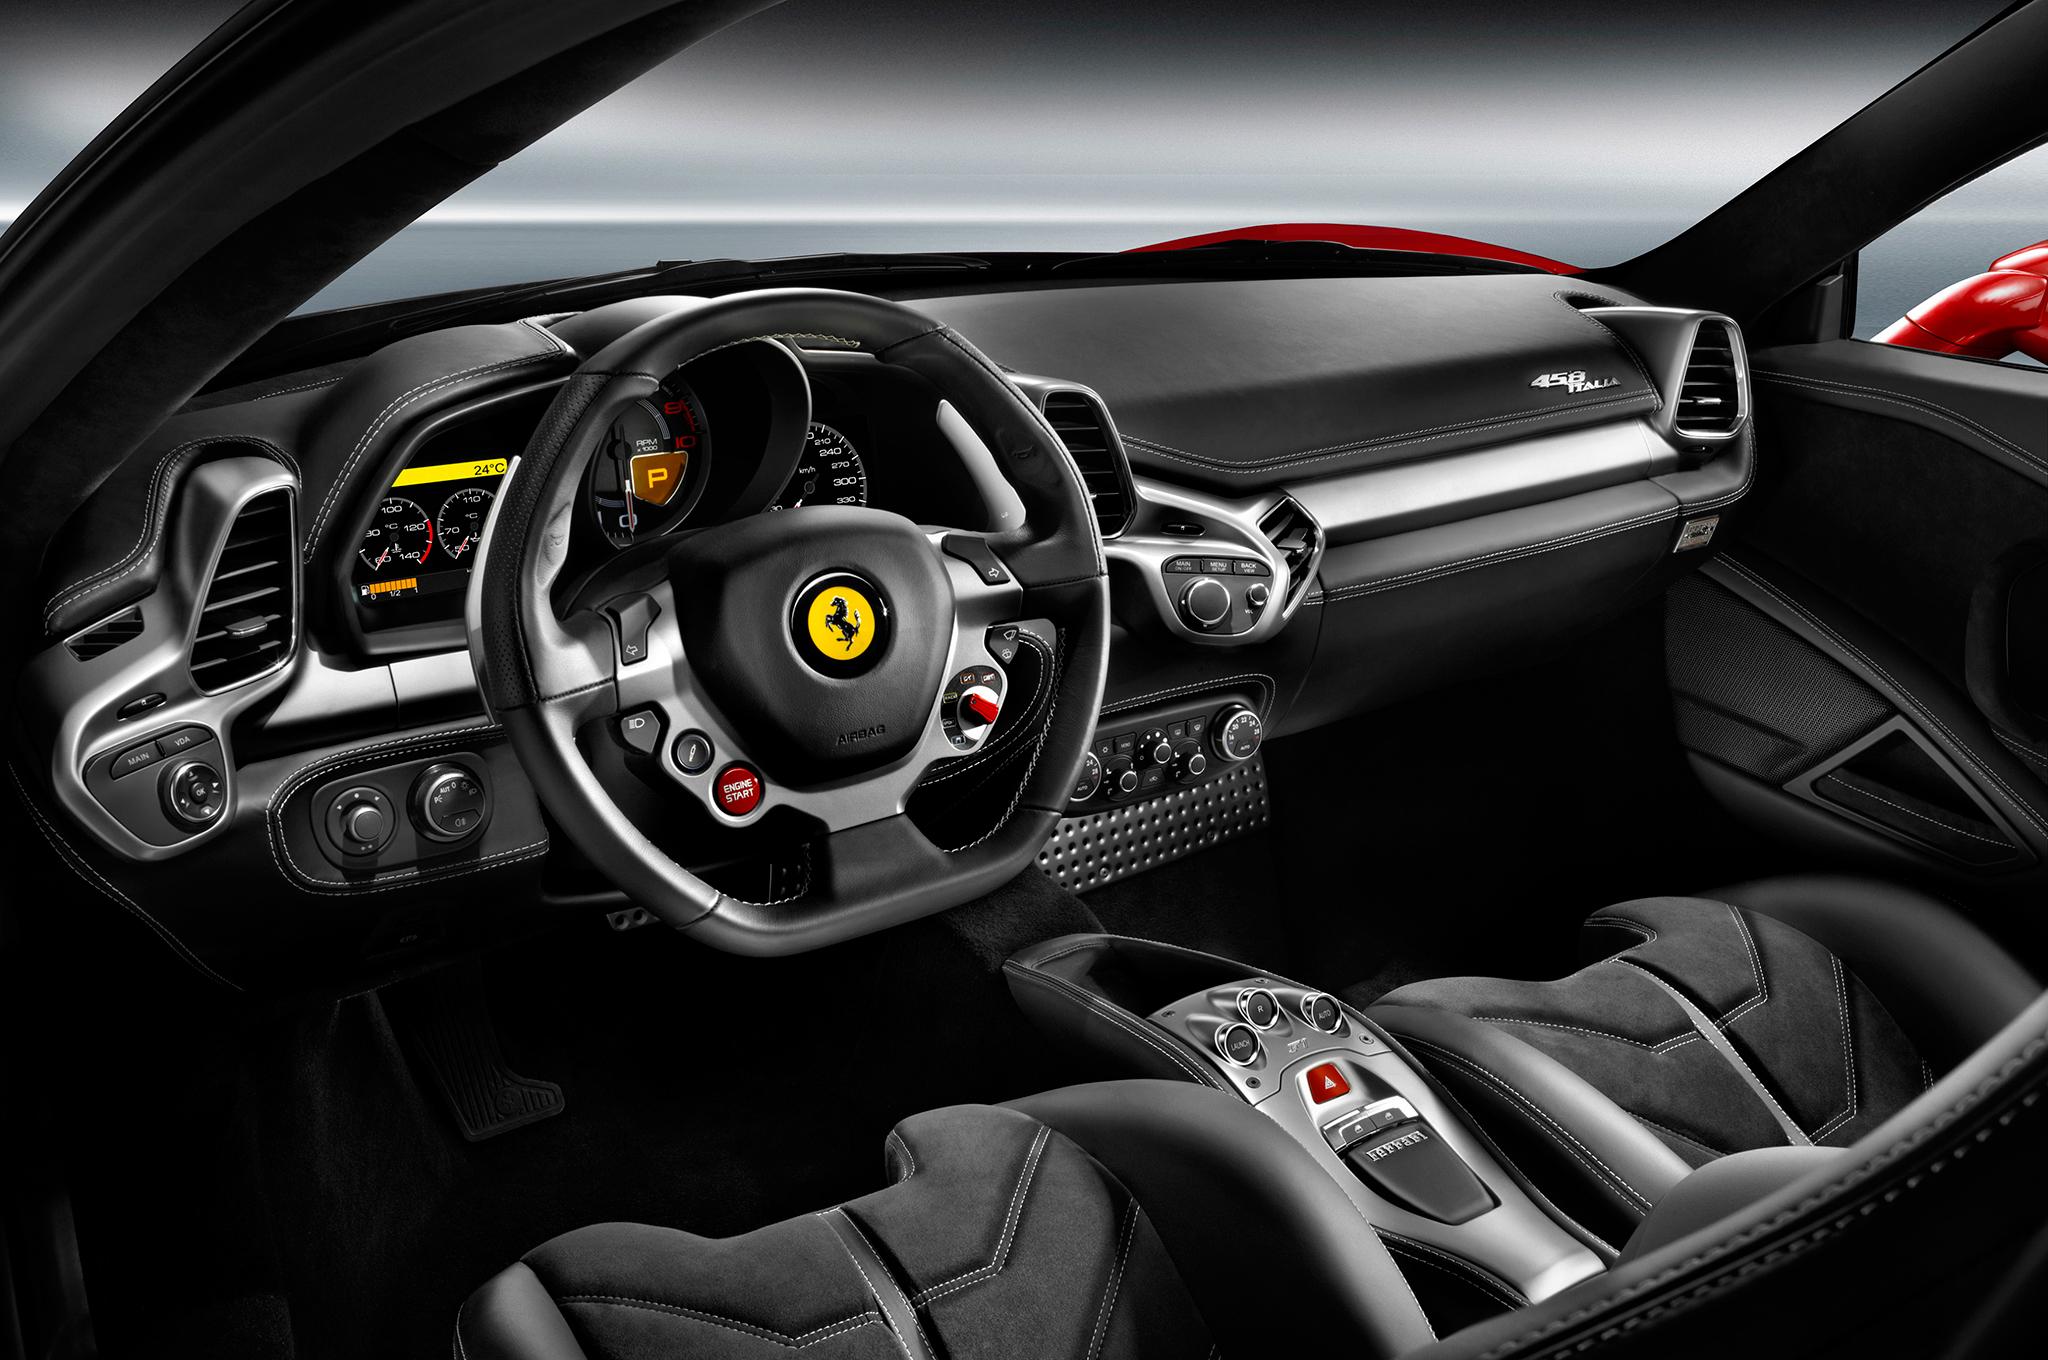 car aventador sport roadster lamborghini ferrari rental luxury aaa hire convertible rome rent